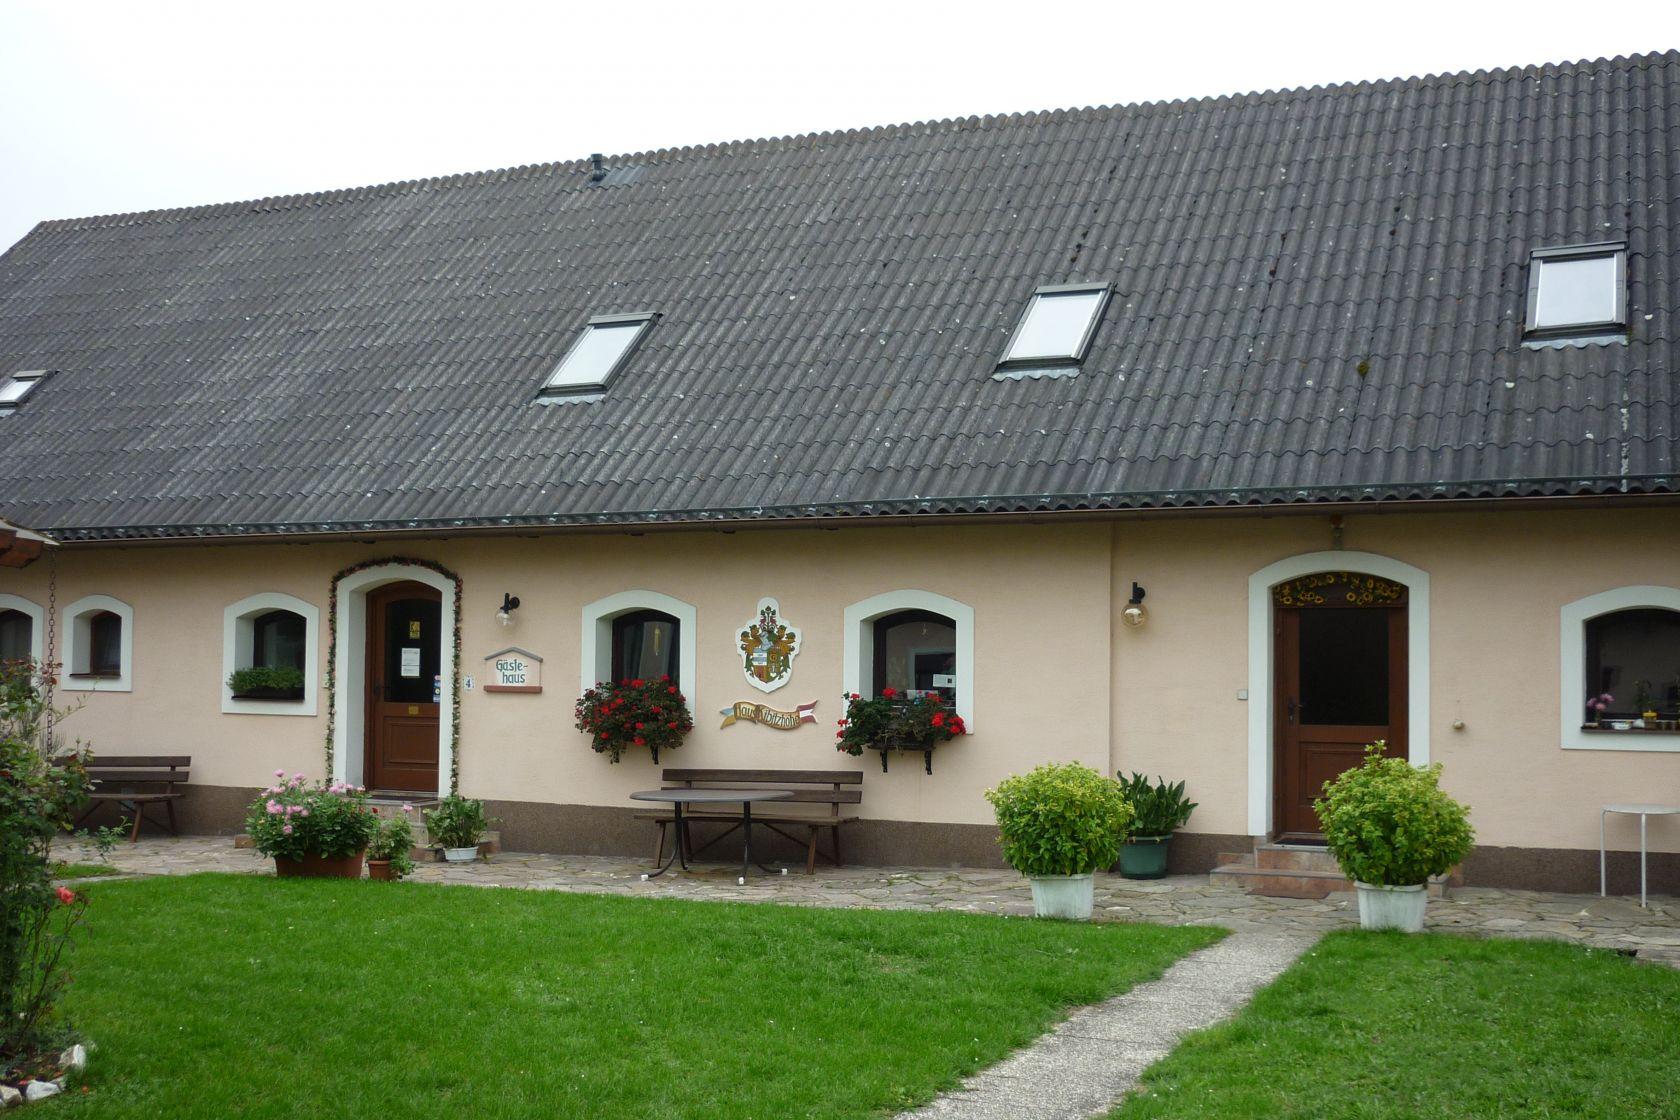 Thayarunde-Haus Kibitzhöhe